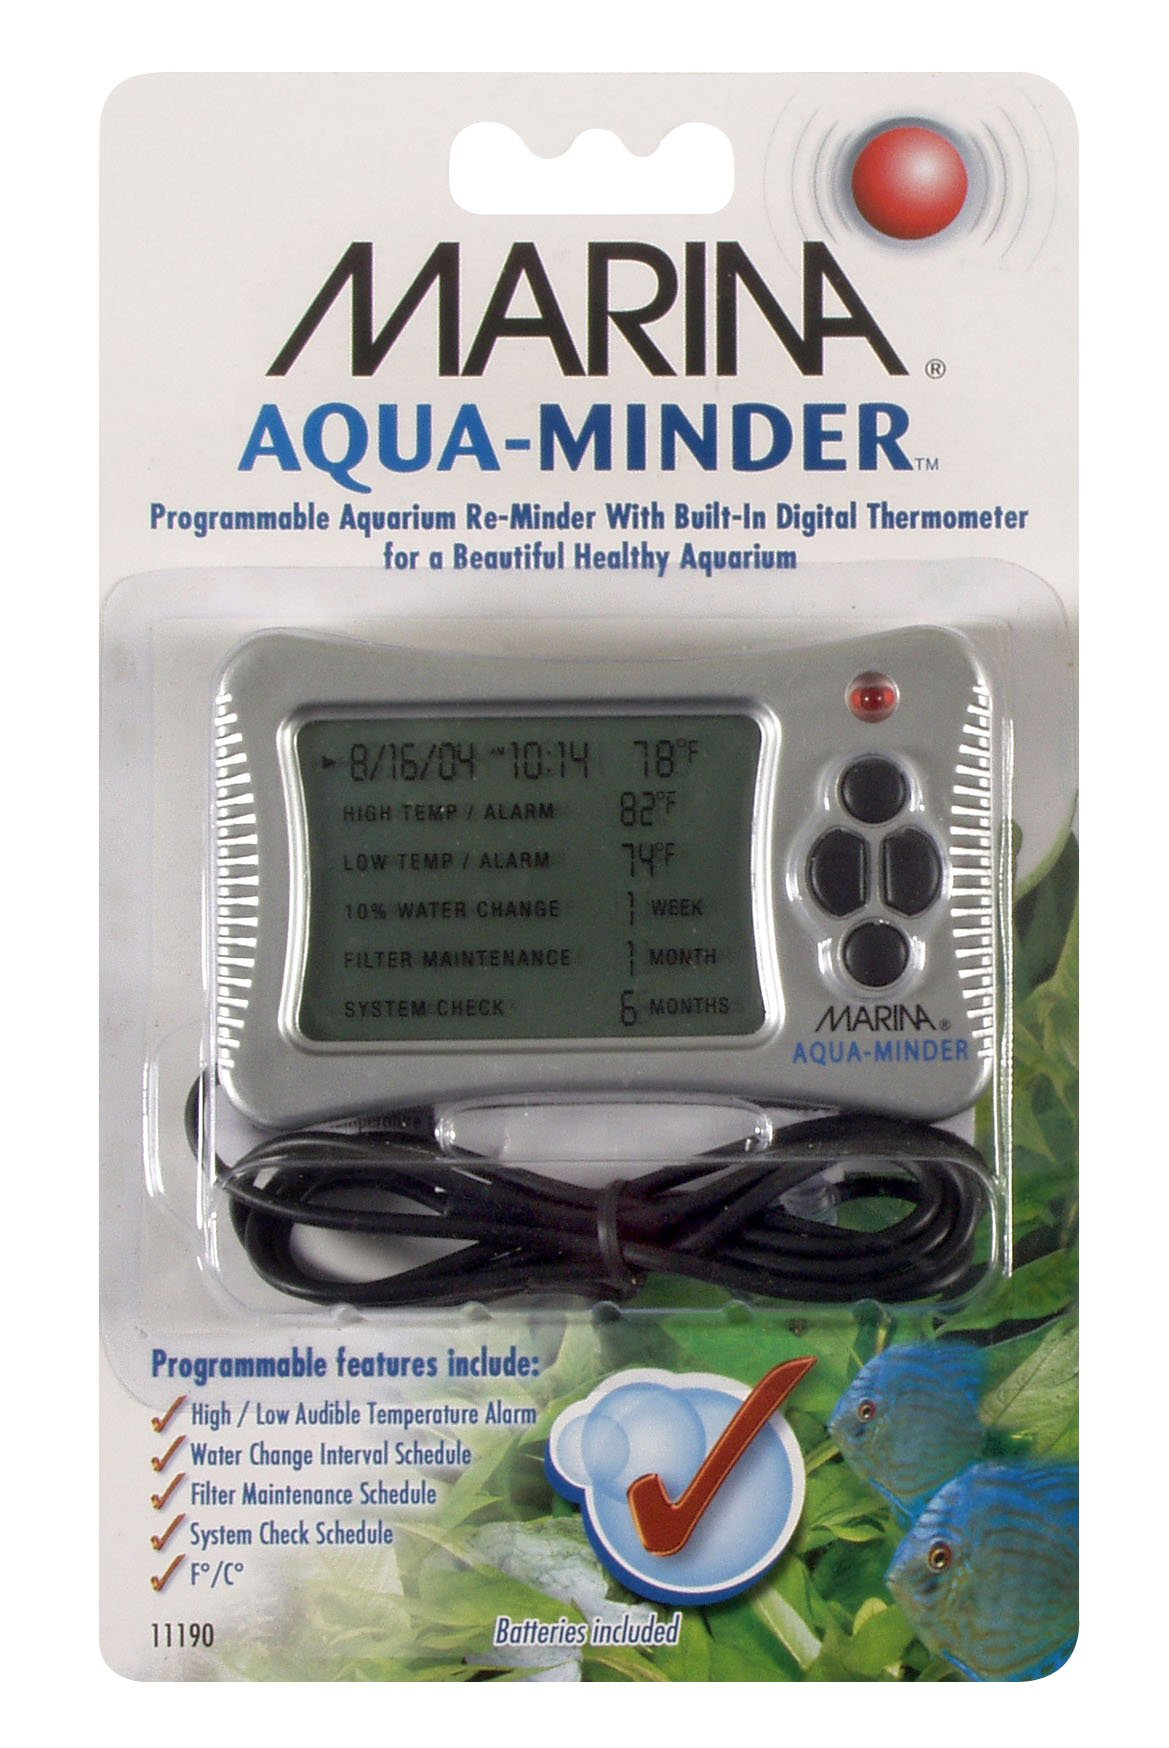 Marina Aqua-Minder Programmable Digital Thermometer